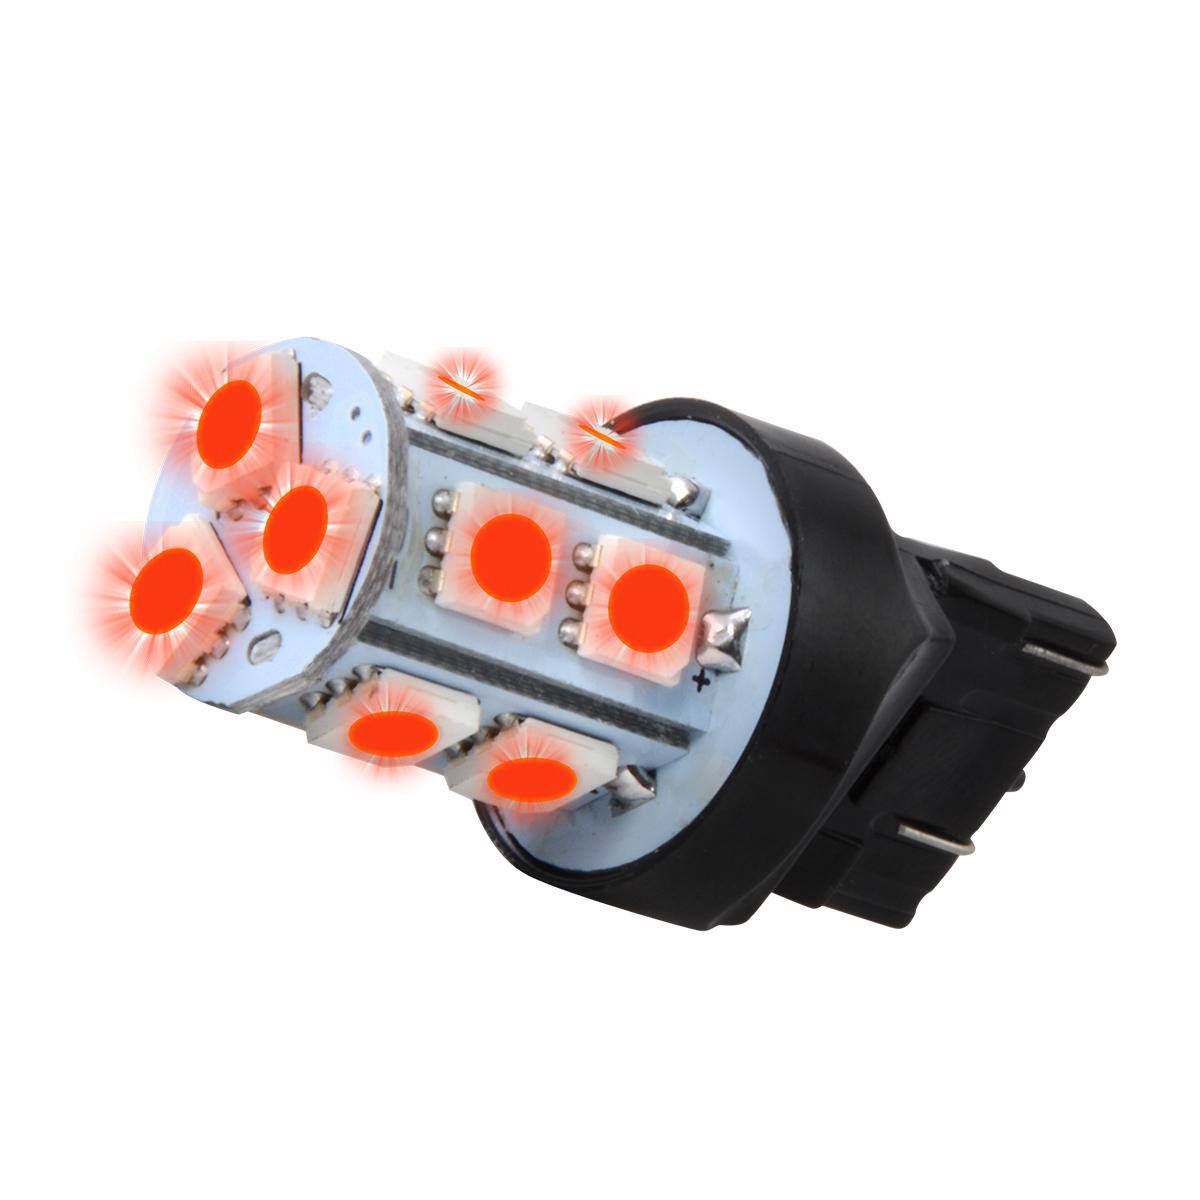 70581 #7440 Tower Style 13 LED Light Bulb